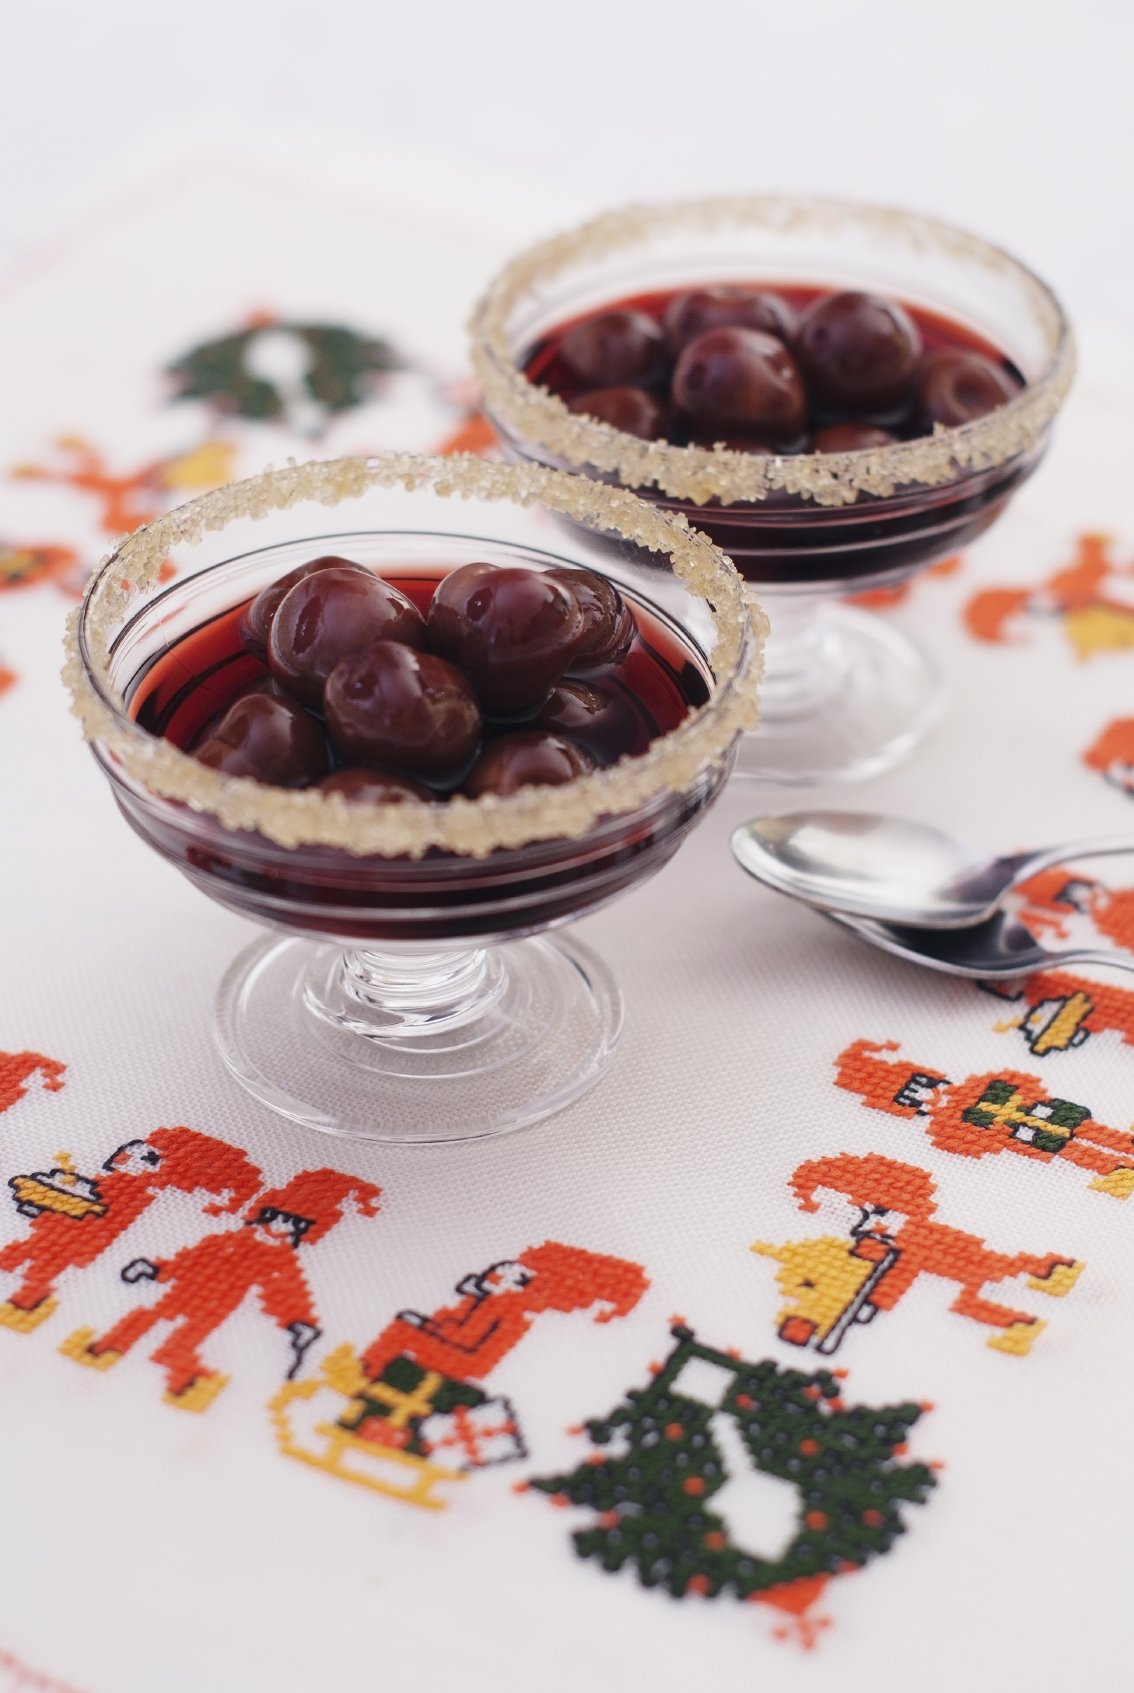 Corona de cerezas al vino tinto